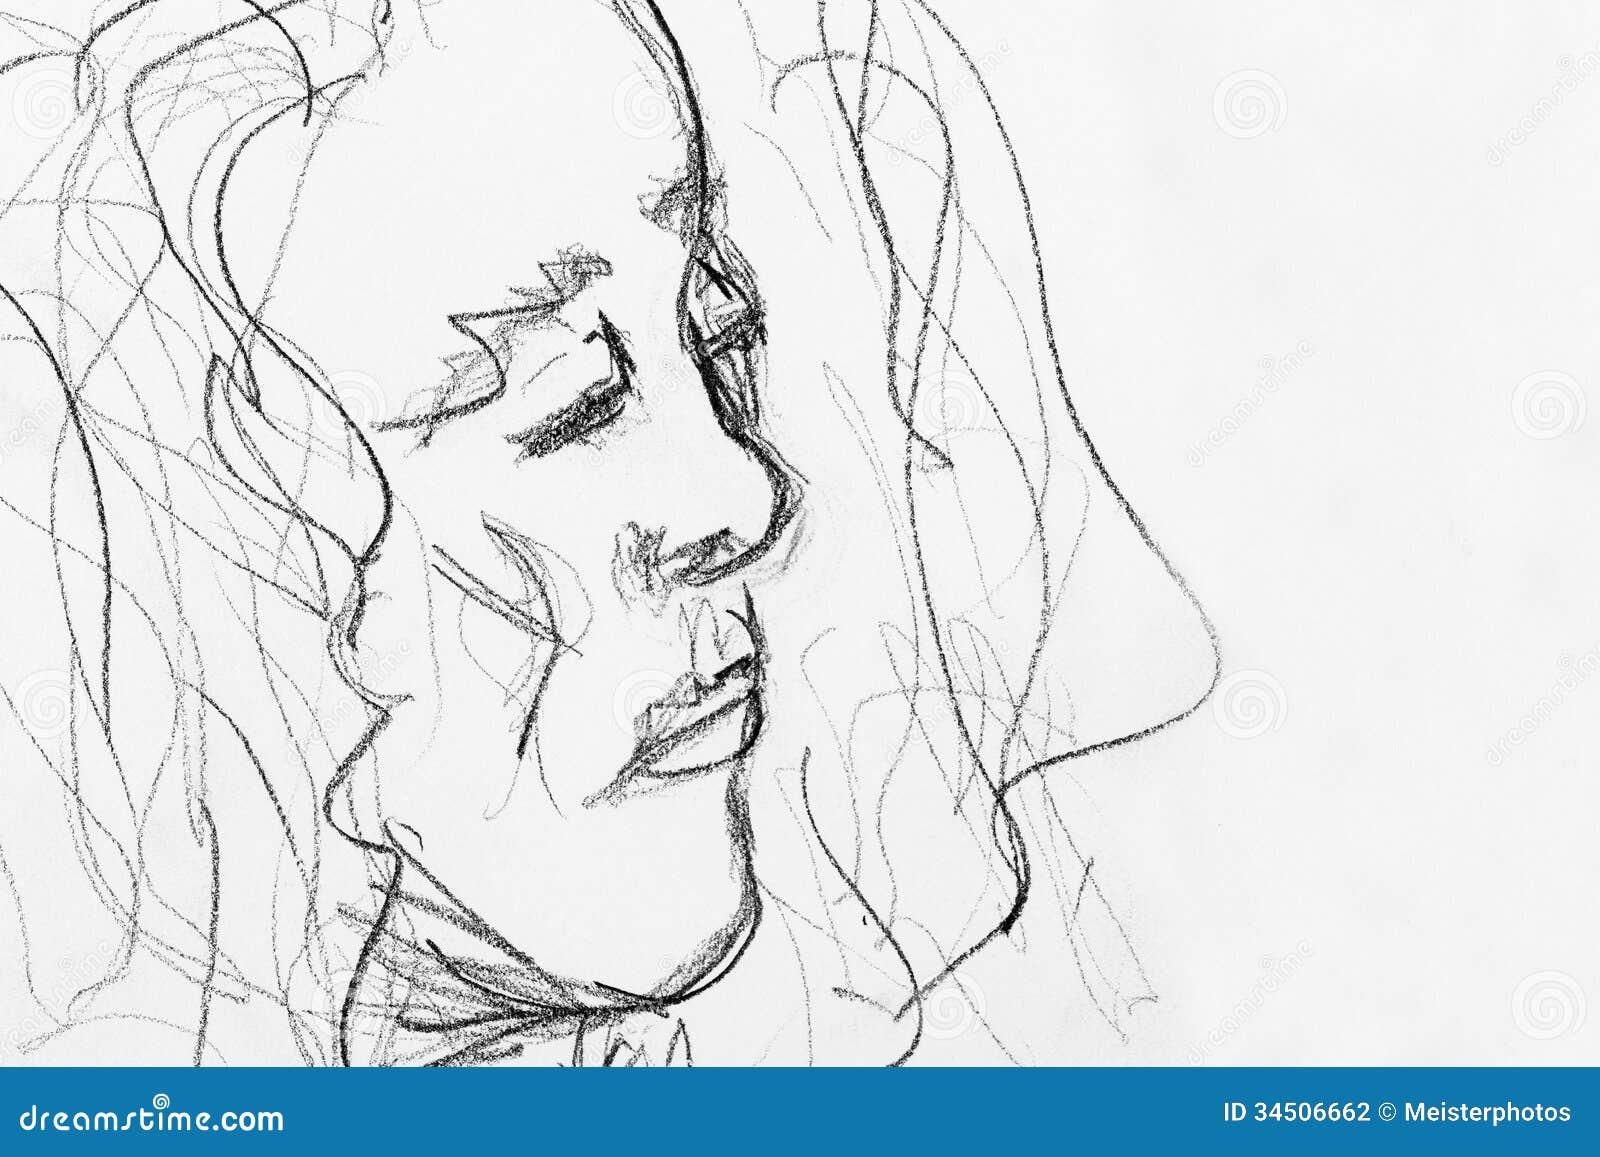 Quick pencil sketch of woman